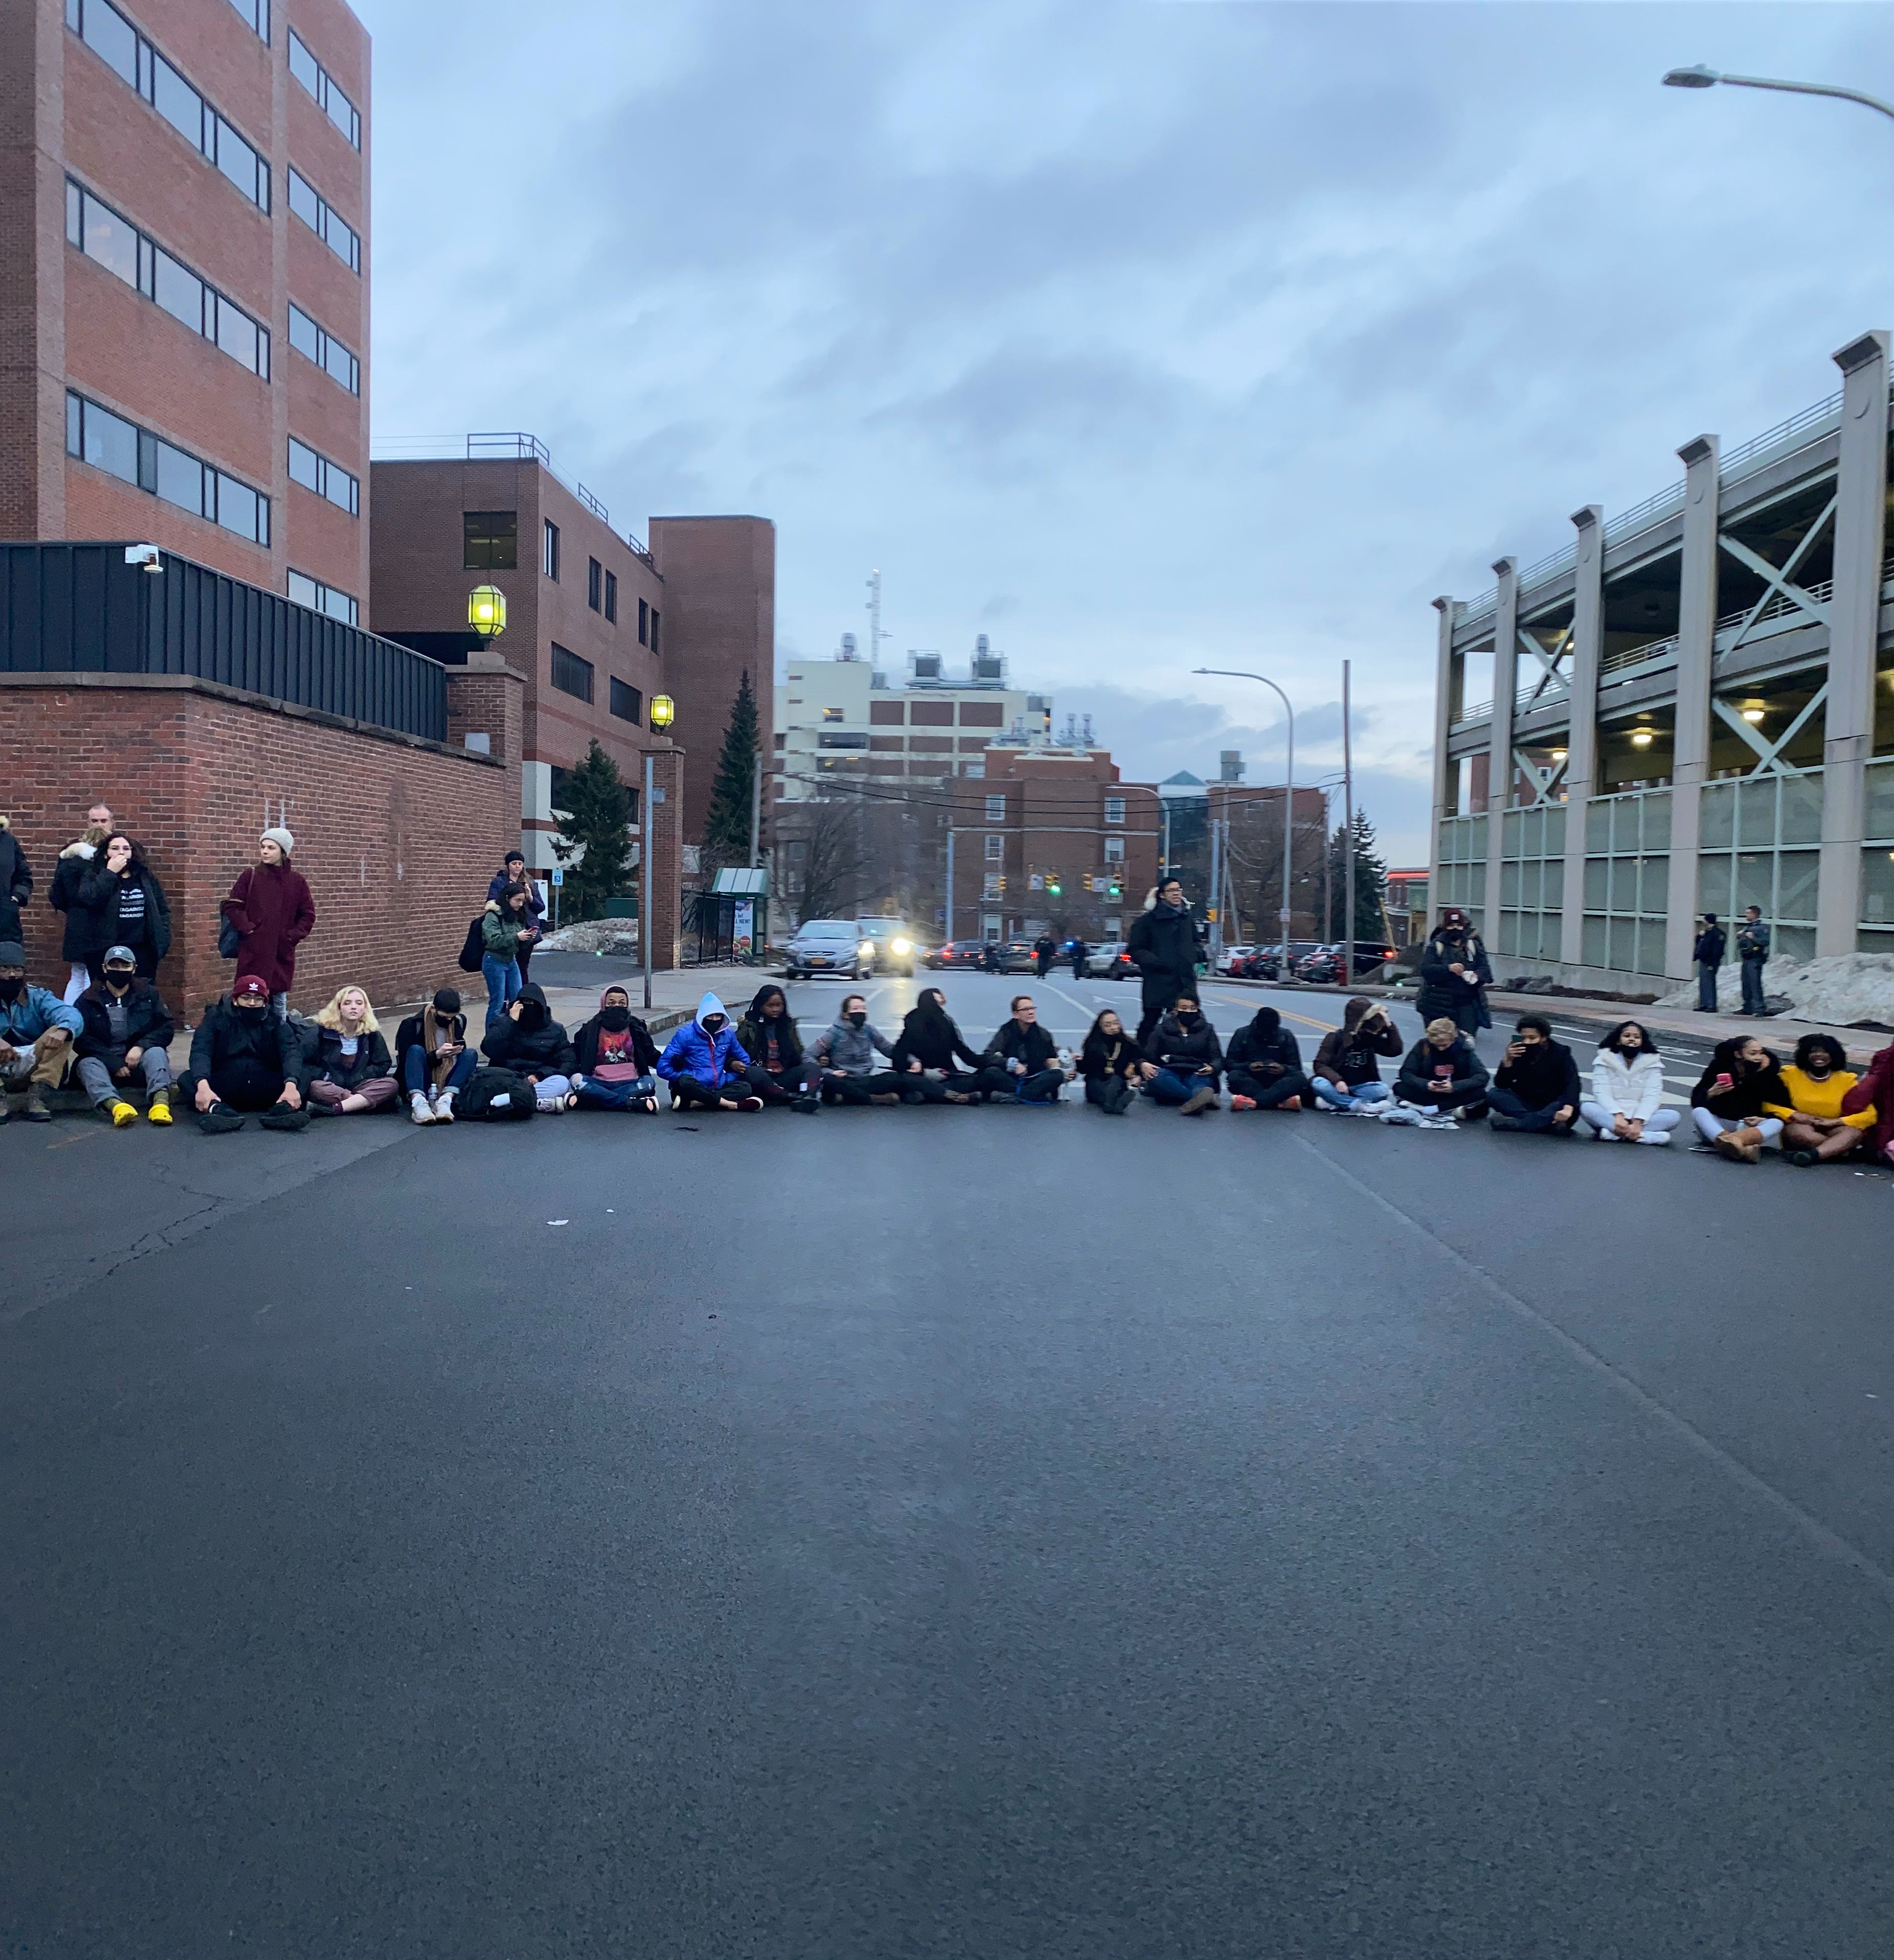 #NotAgainSU Protest at Syracuse University - Feb. 26, 2020 -